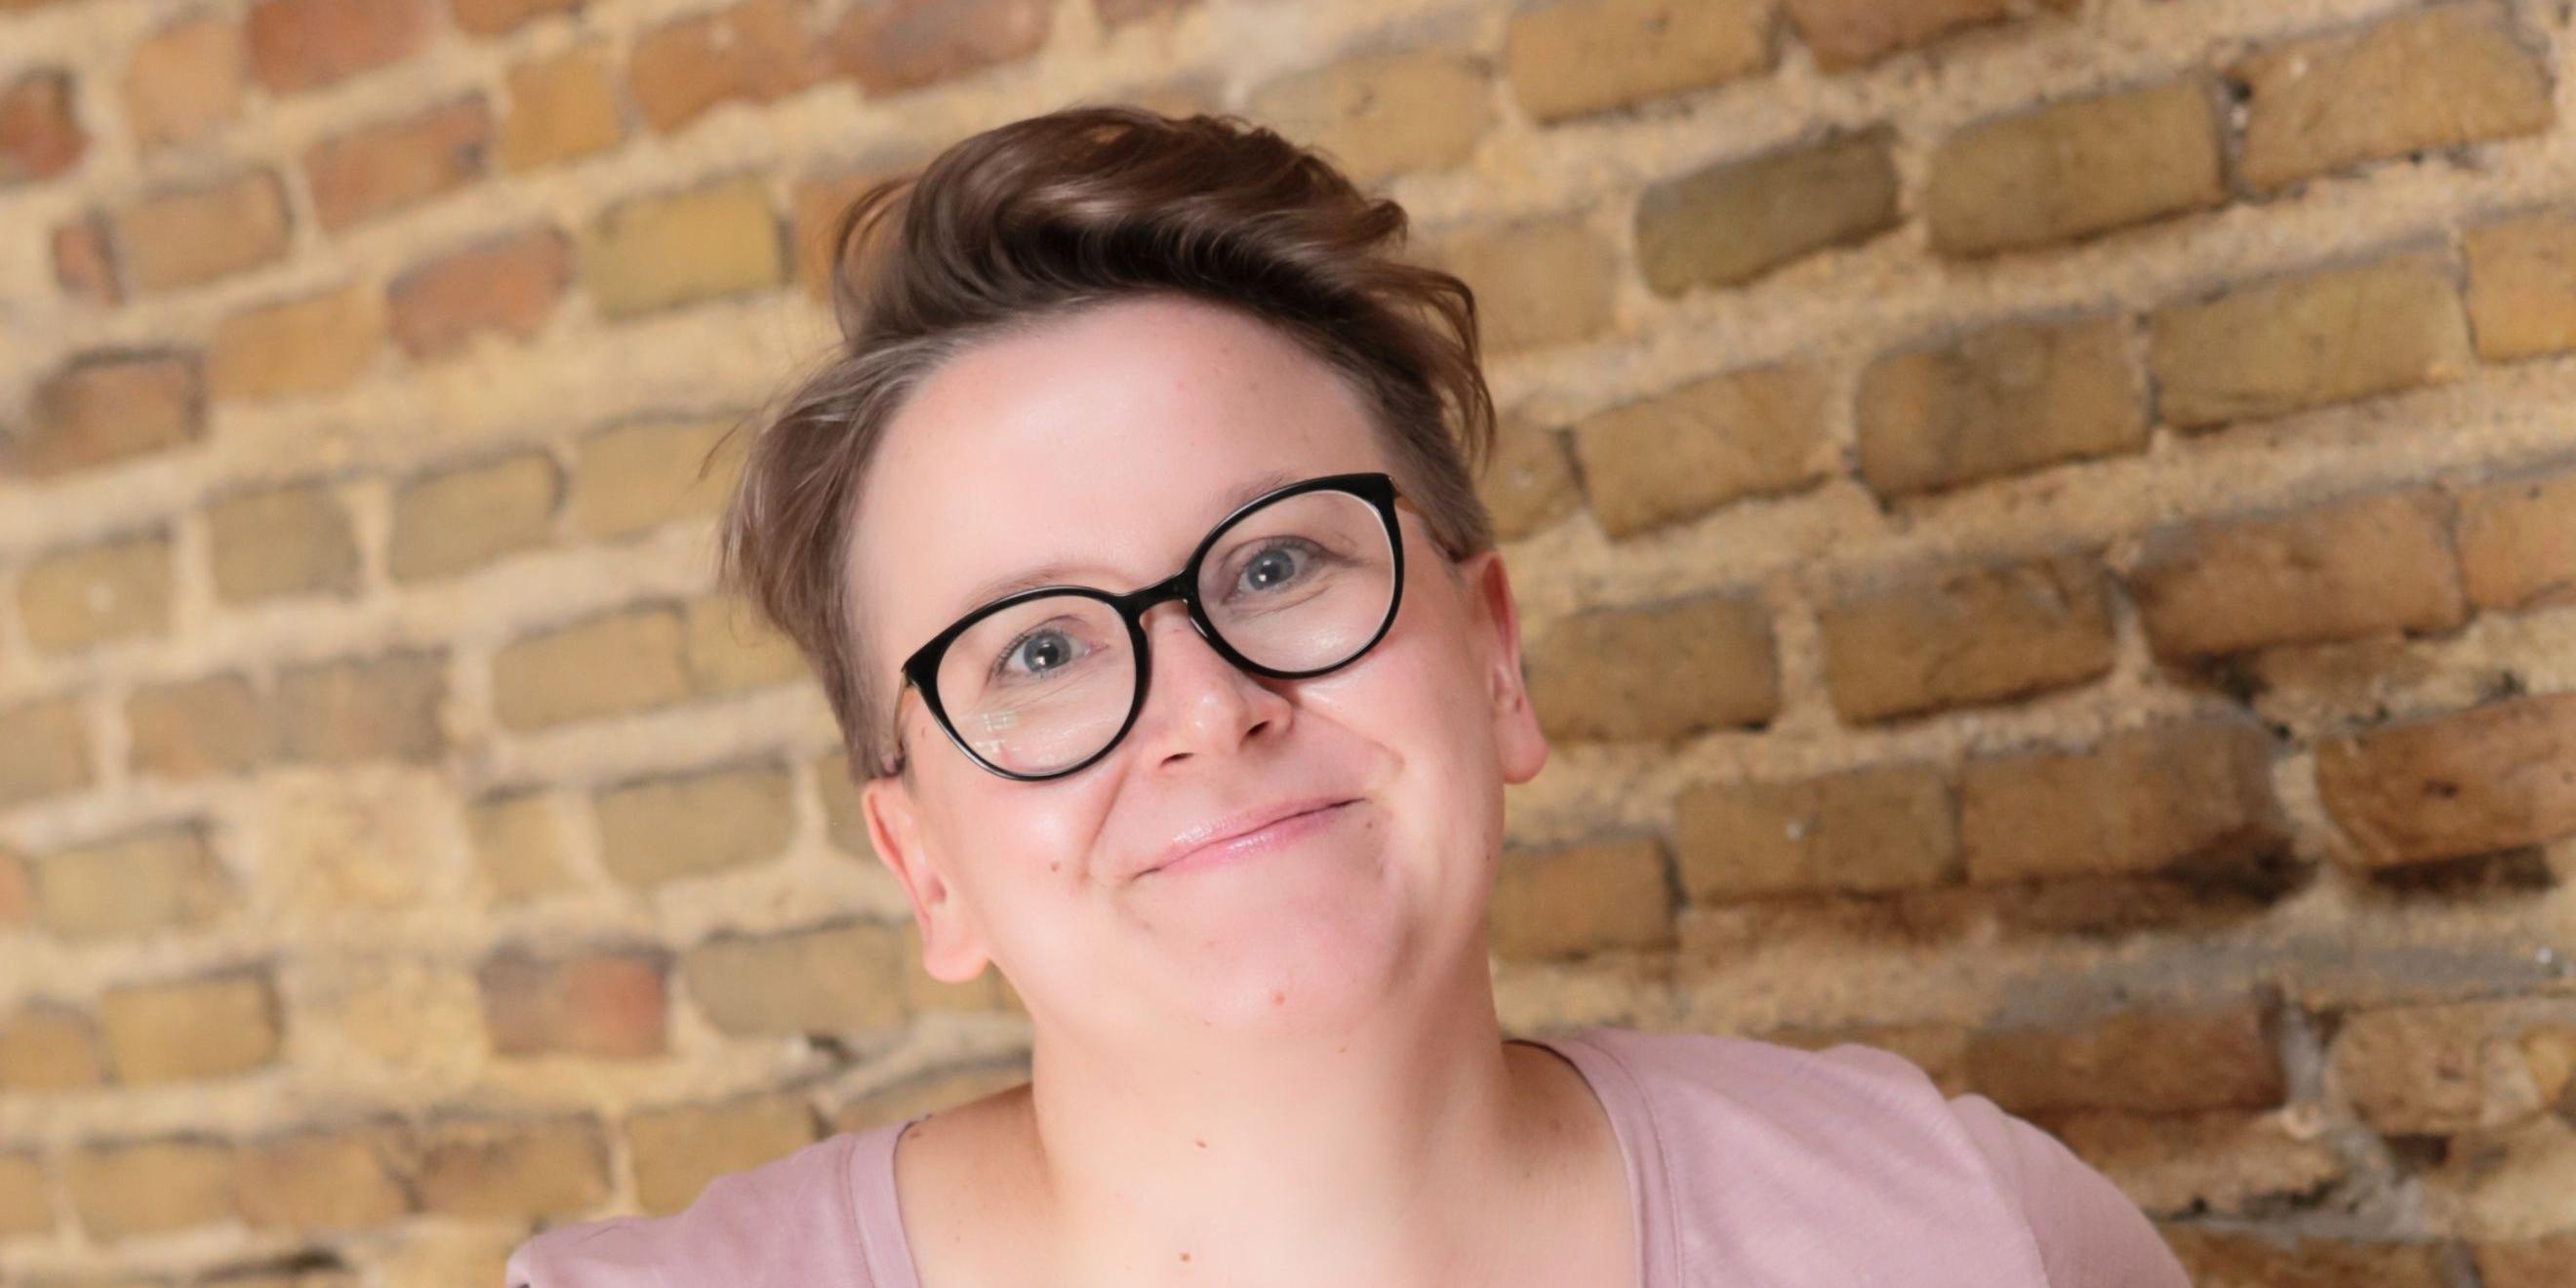 Maja Drabczyk, Poland, participant in the GCLP 2017 edition